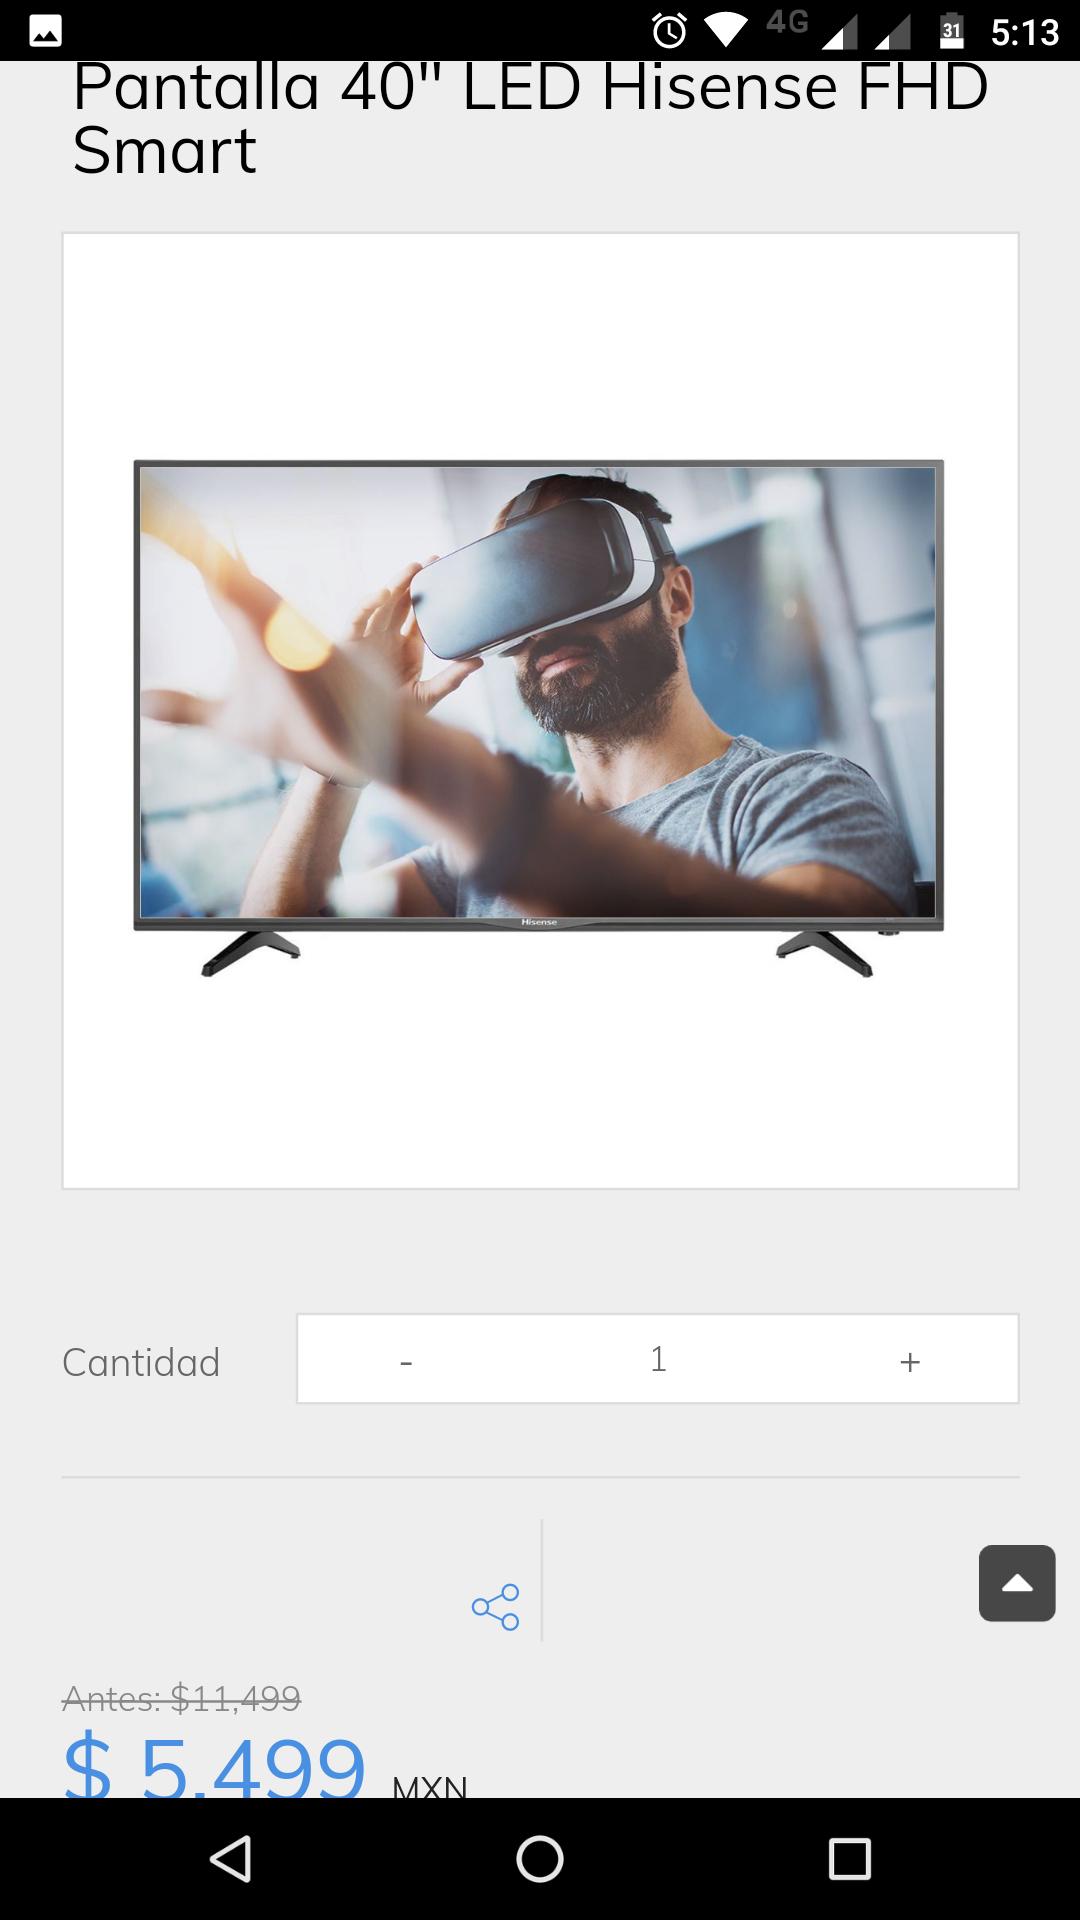 Sanborns TV Hisense Smart 40 pulgadas